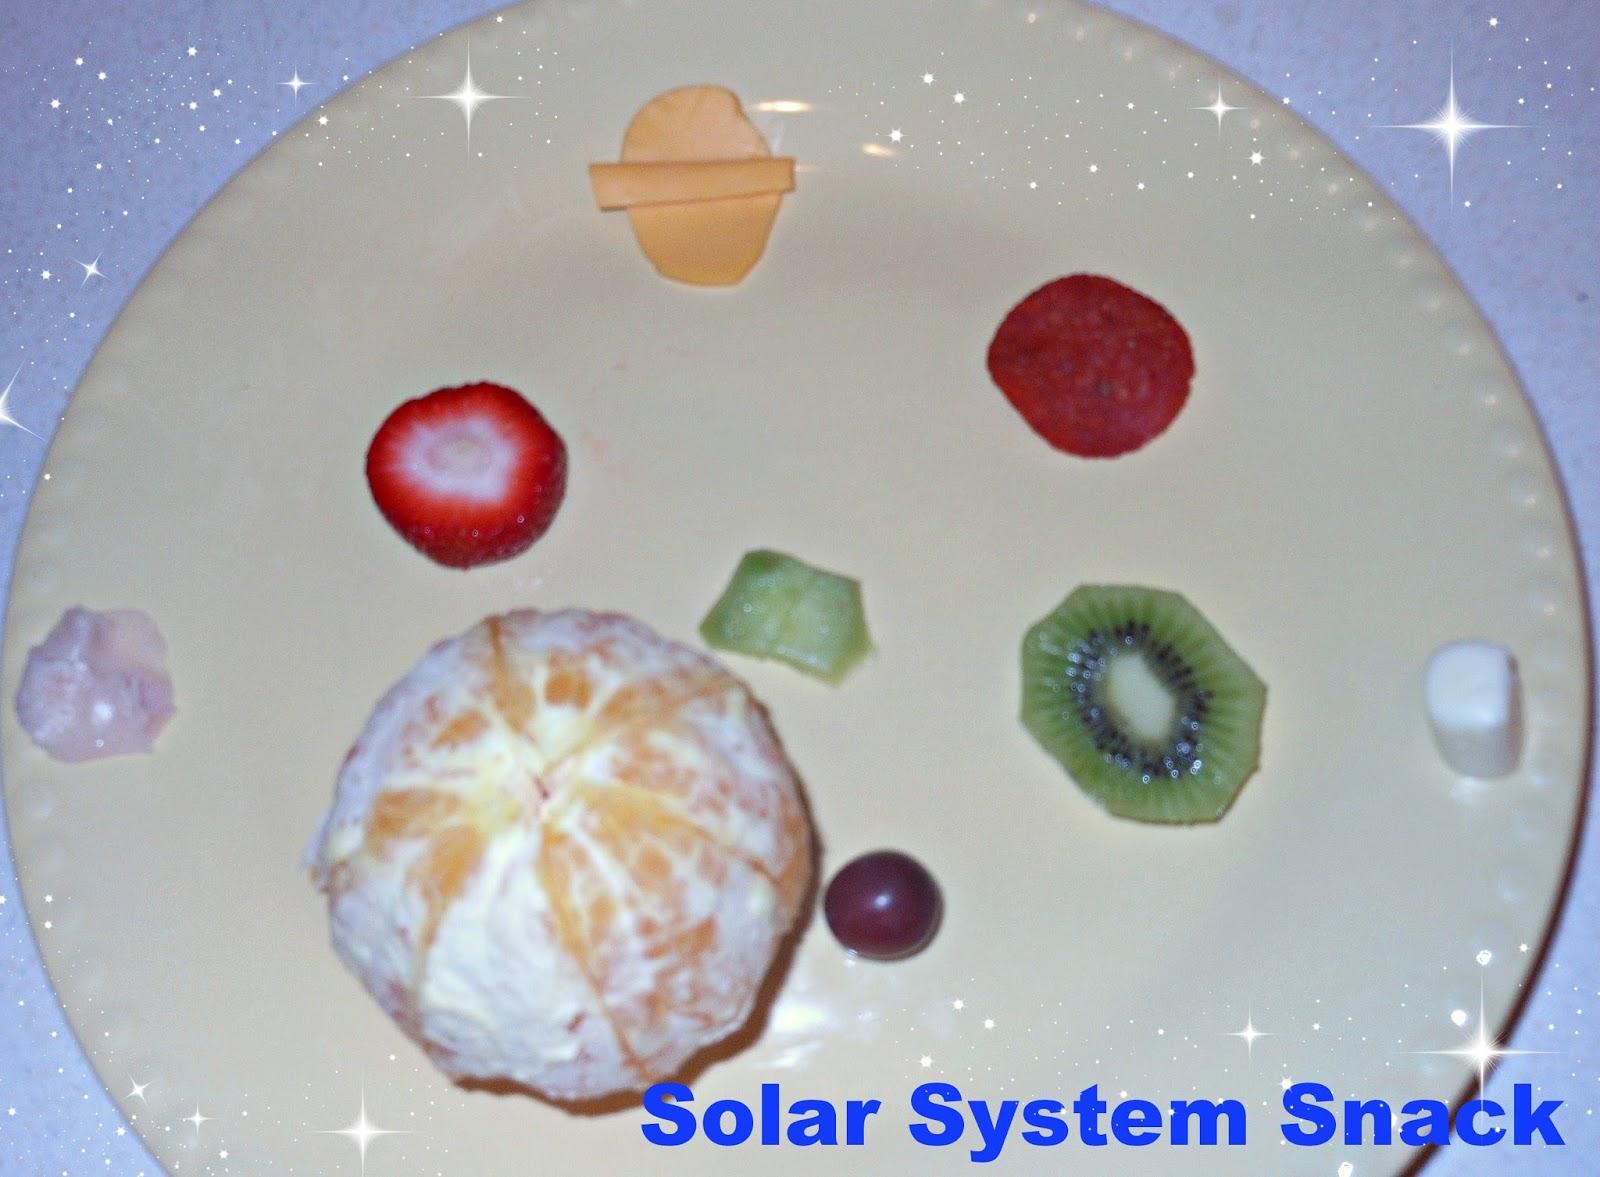 solar system food ideas - photo #4